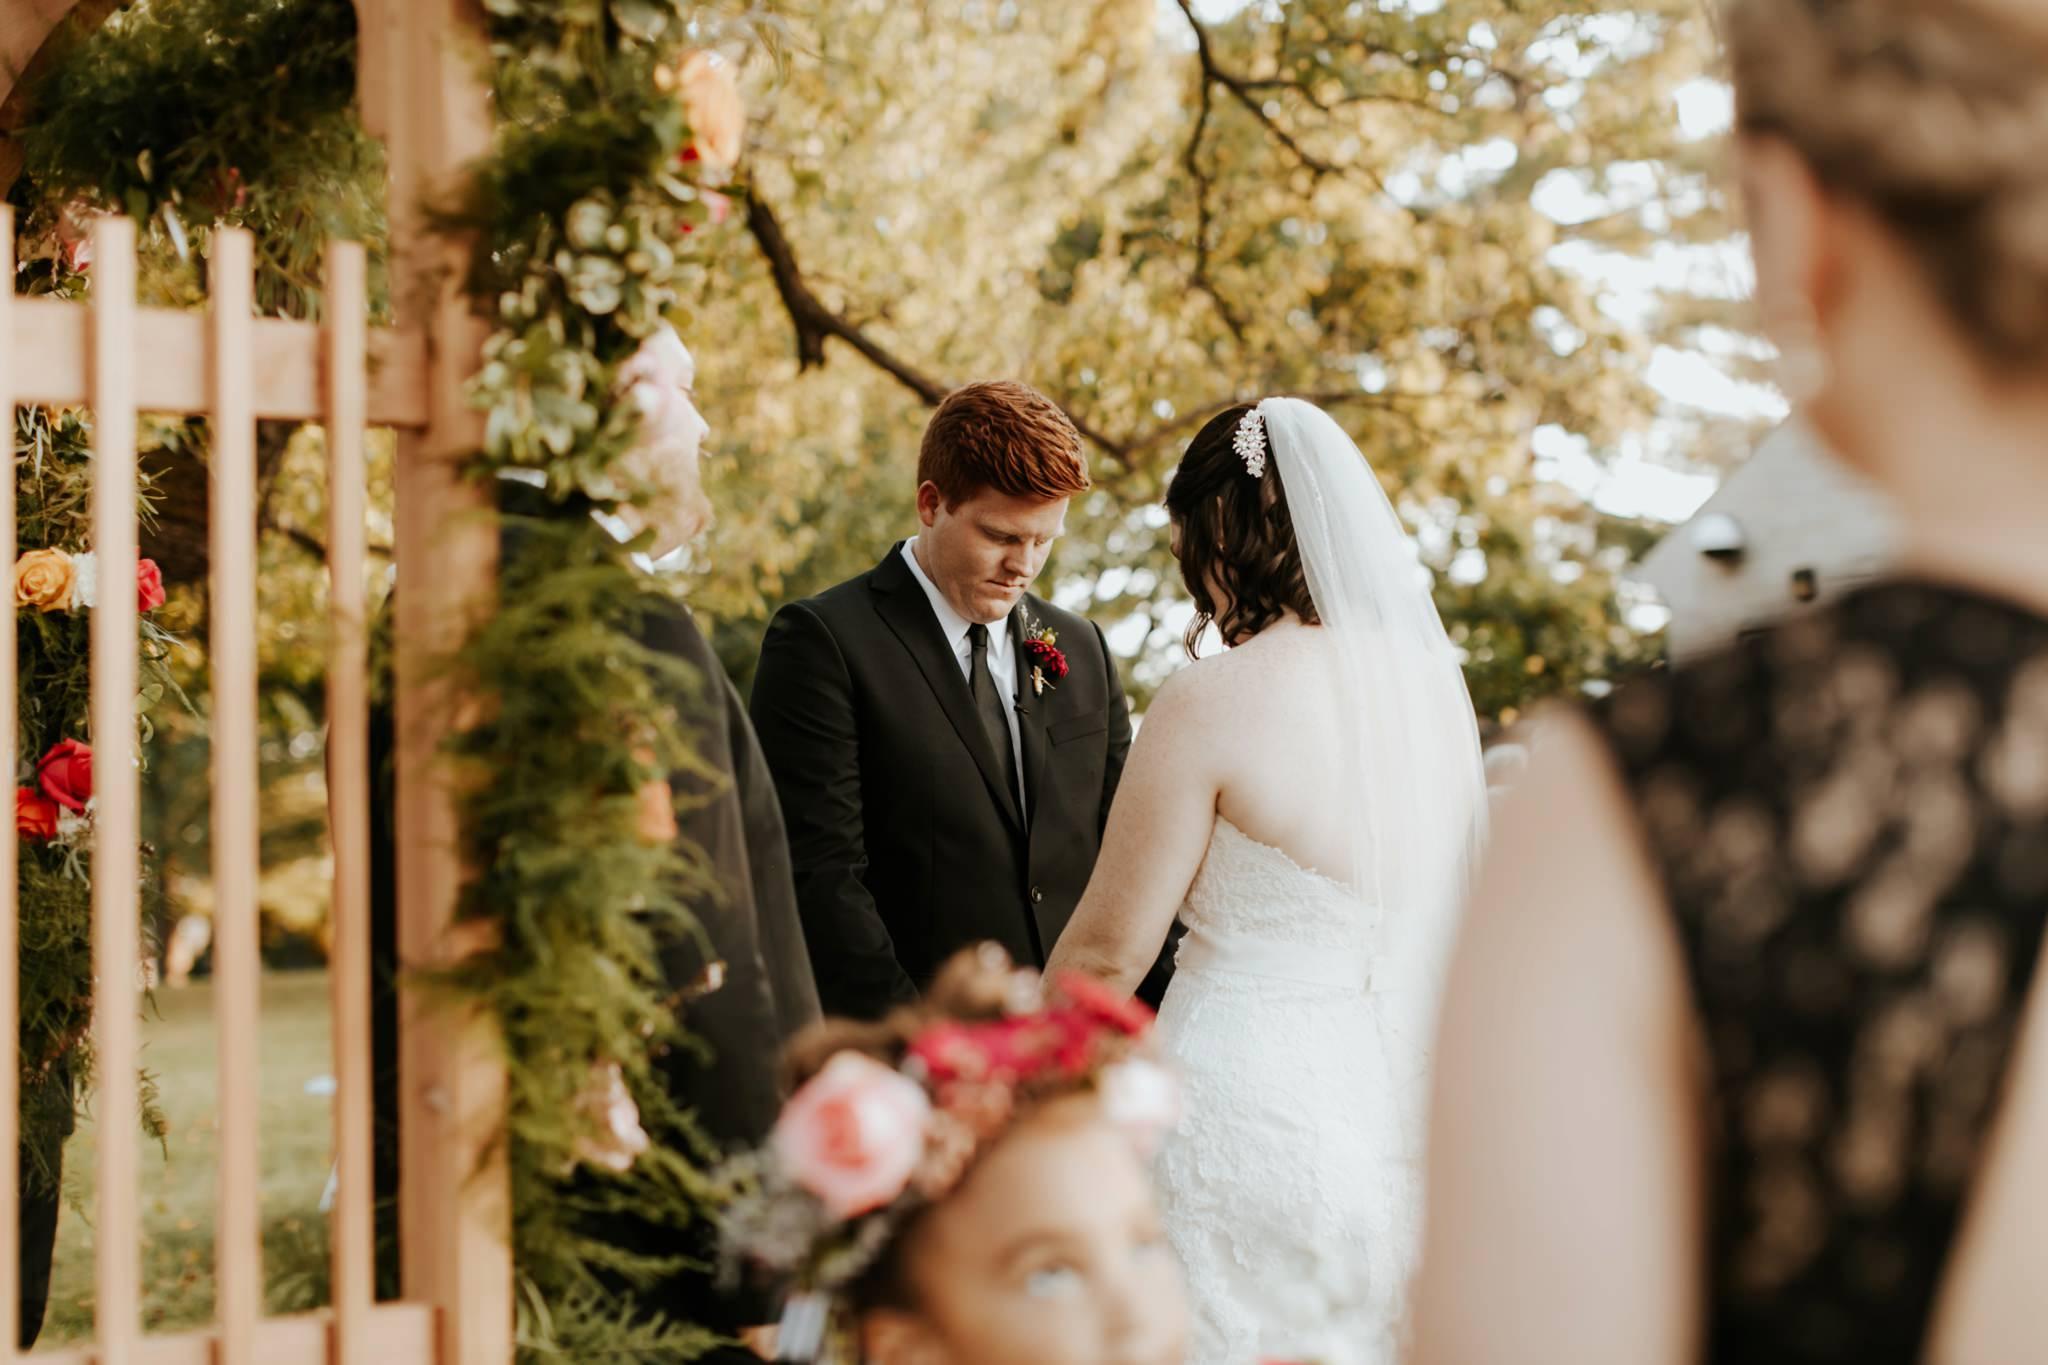 17-09-15 Lindsey and Brandon Wedding Edited-700_WEB.jpg